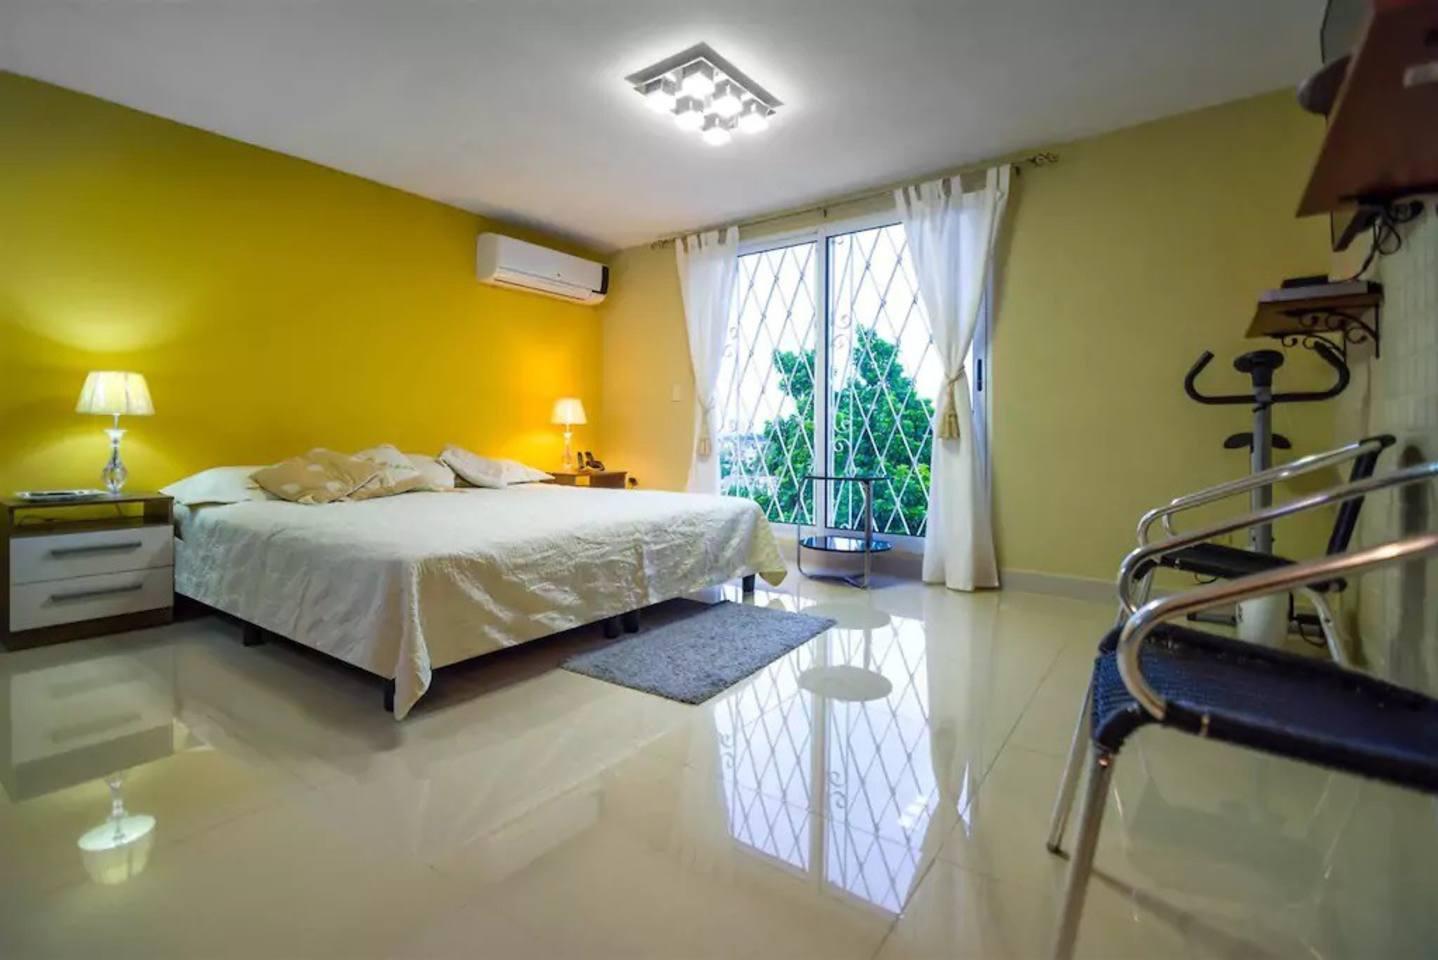 Apartment Villa Don Teto Suite   8 Rooms  Great Havana View photo 26030641